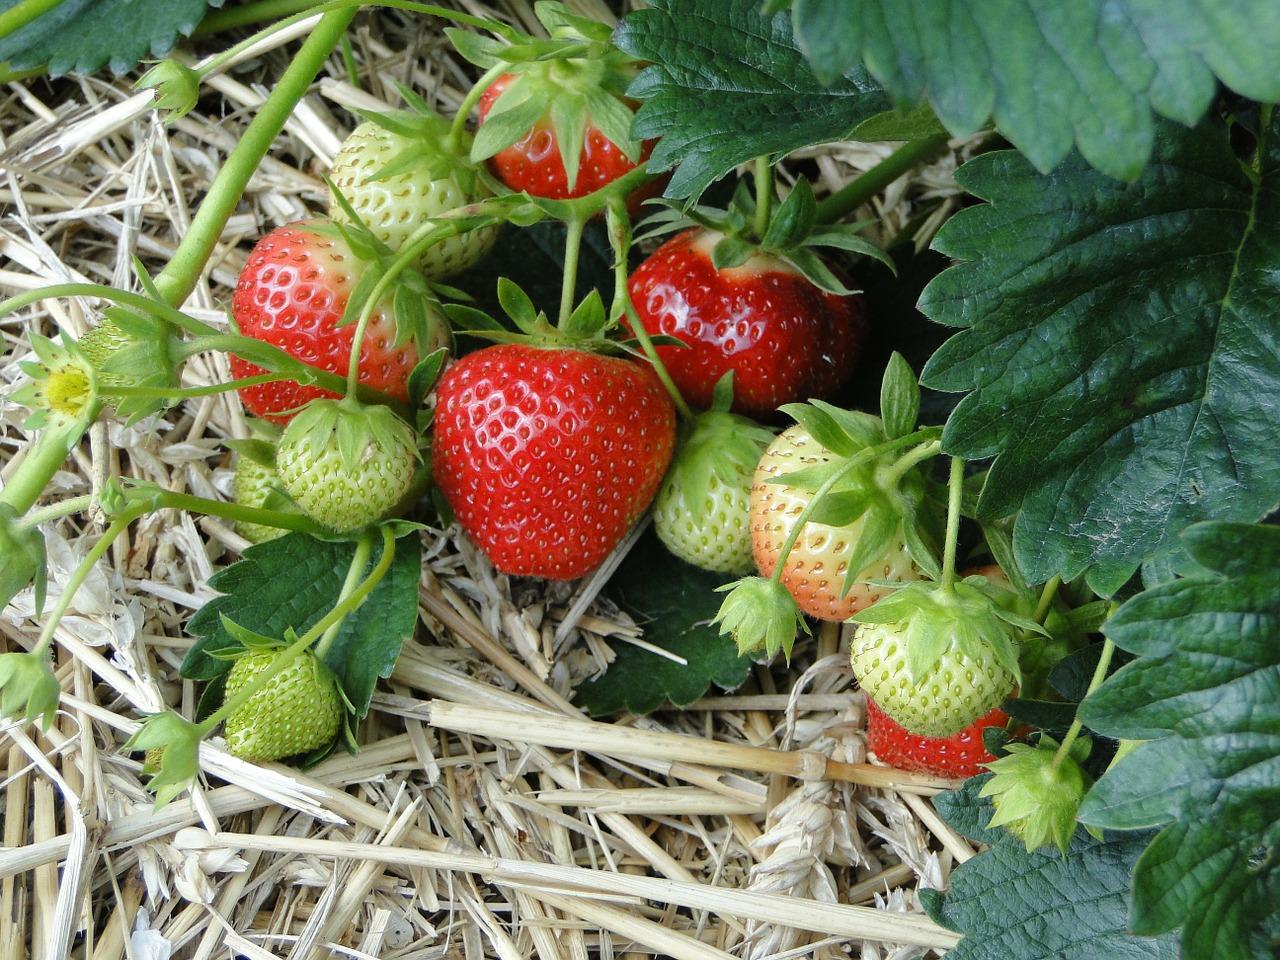 Erdbeeren am besten im Spätsommer pflanzen